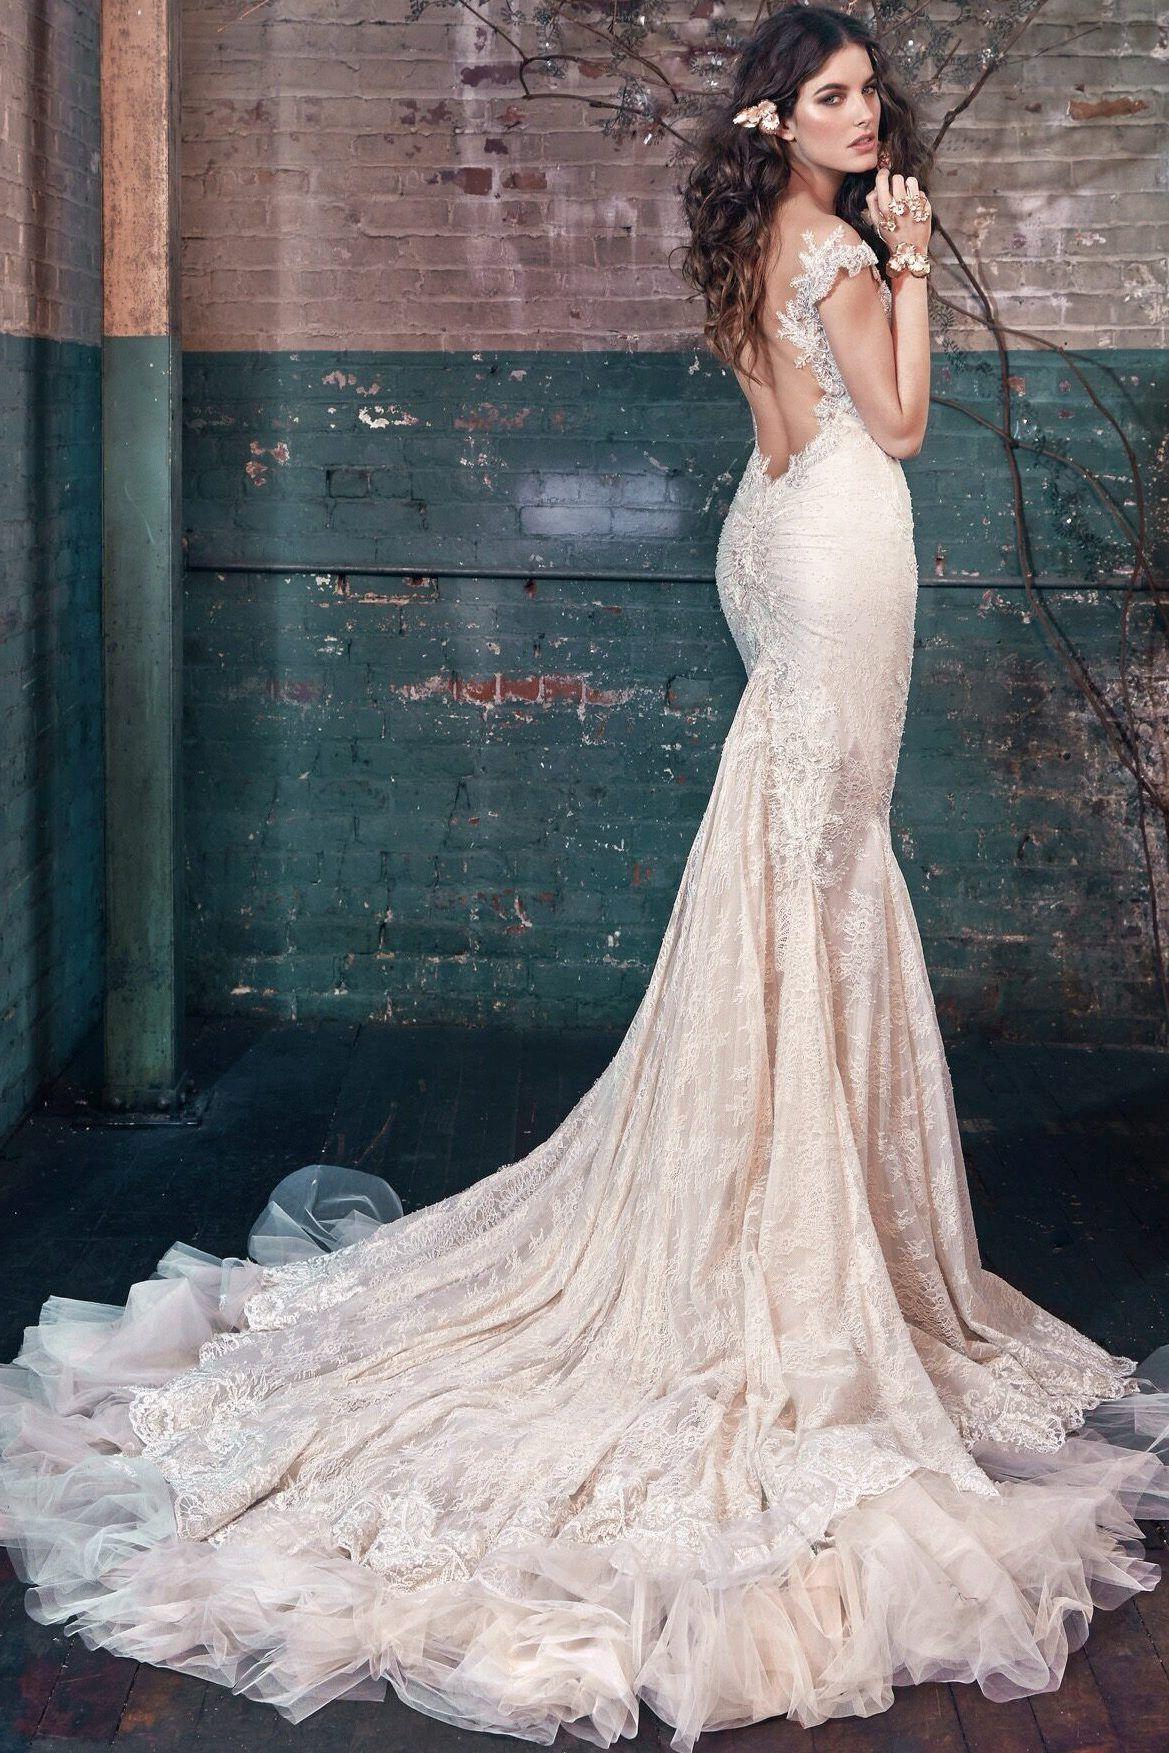 Blossom By Galia Lahav Haute Couture Wedding Dress